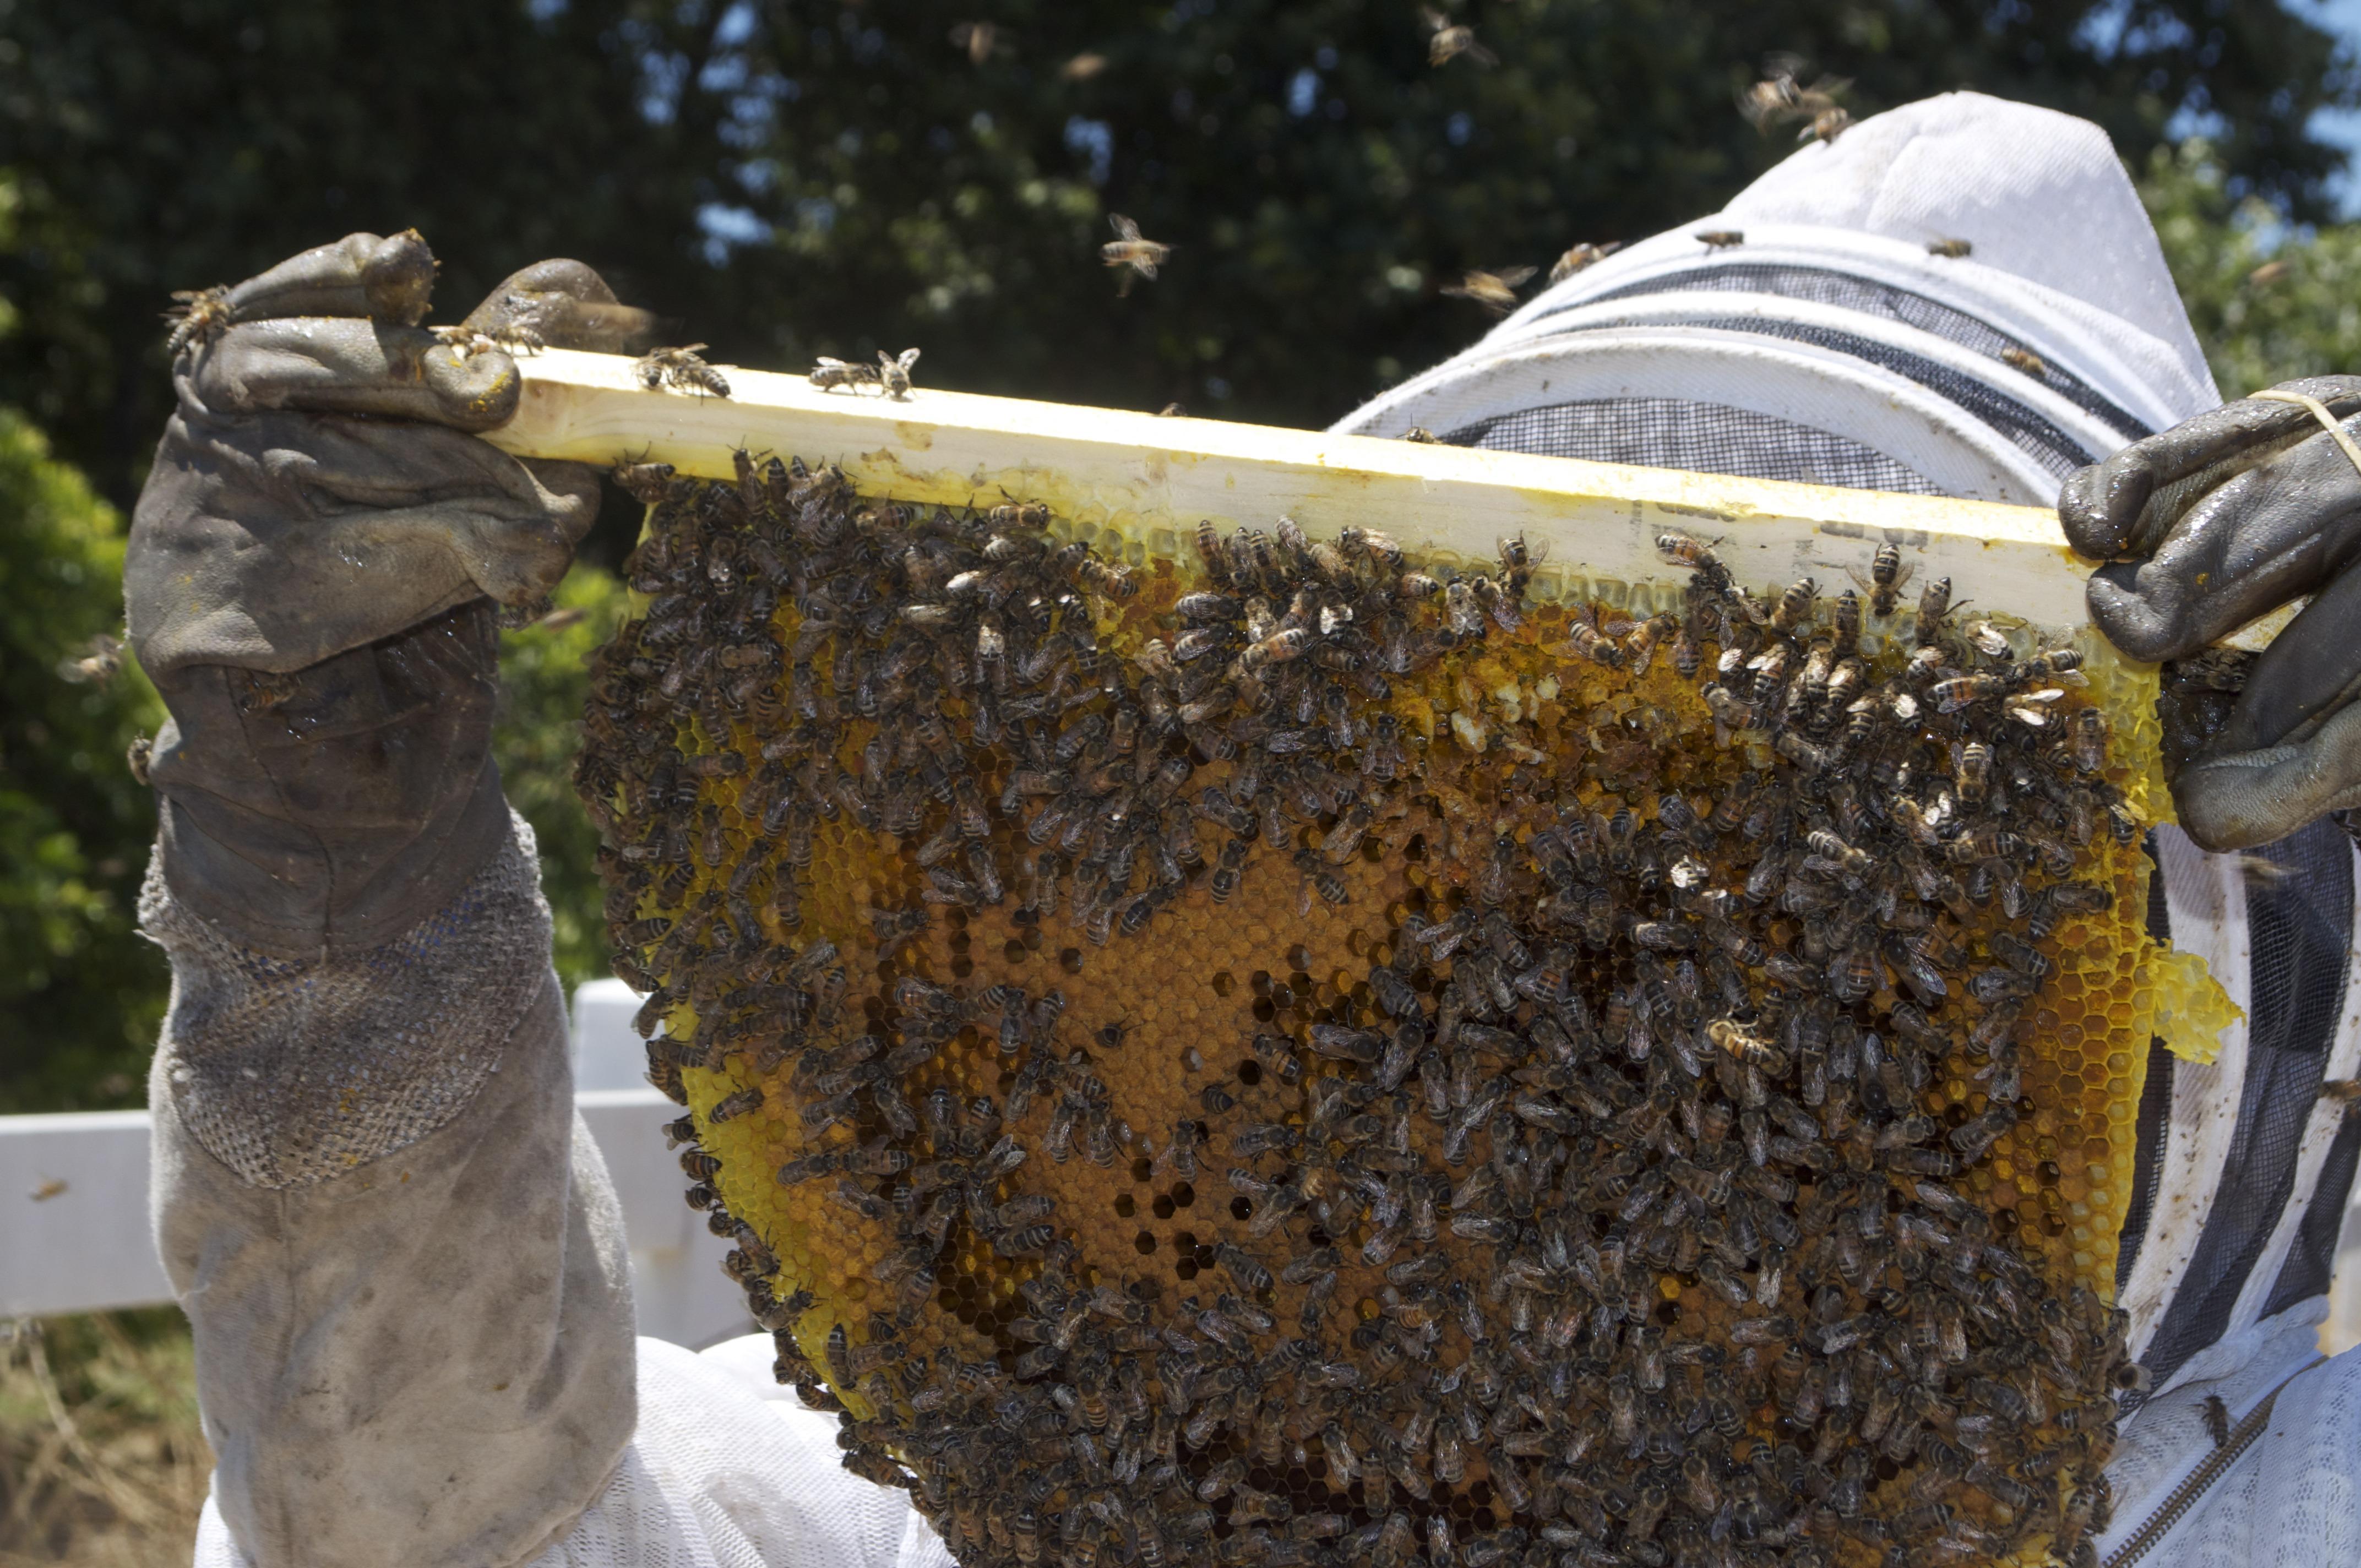 Fotos gratis : insecto, suelo, fauna, invertebrado, apicultor ...